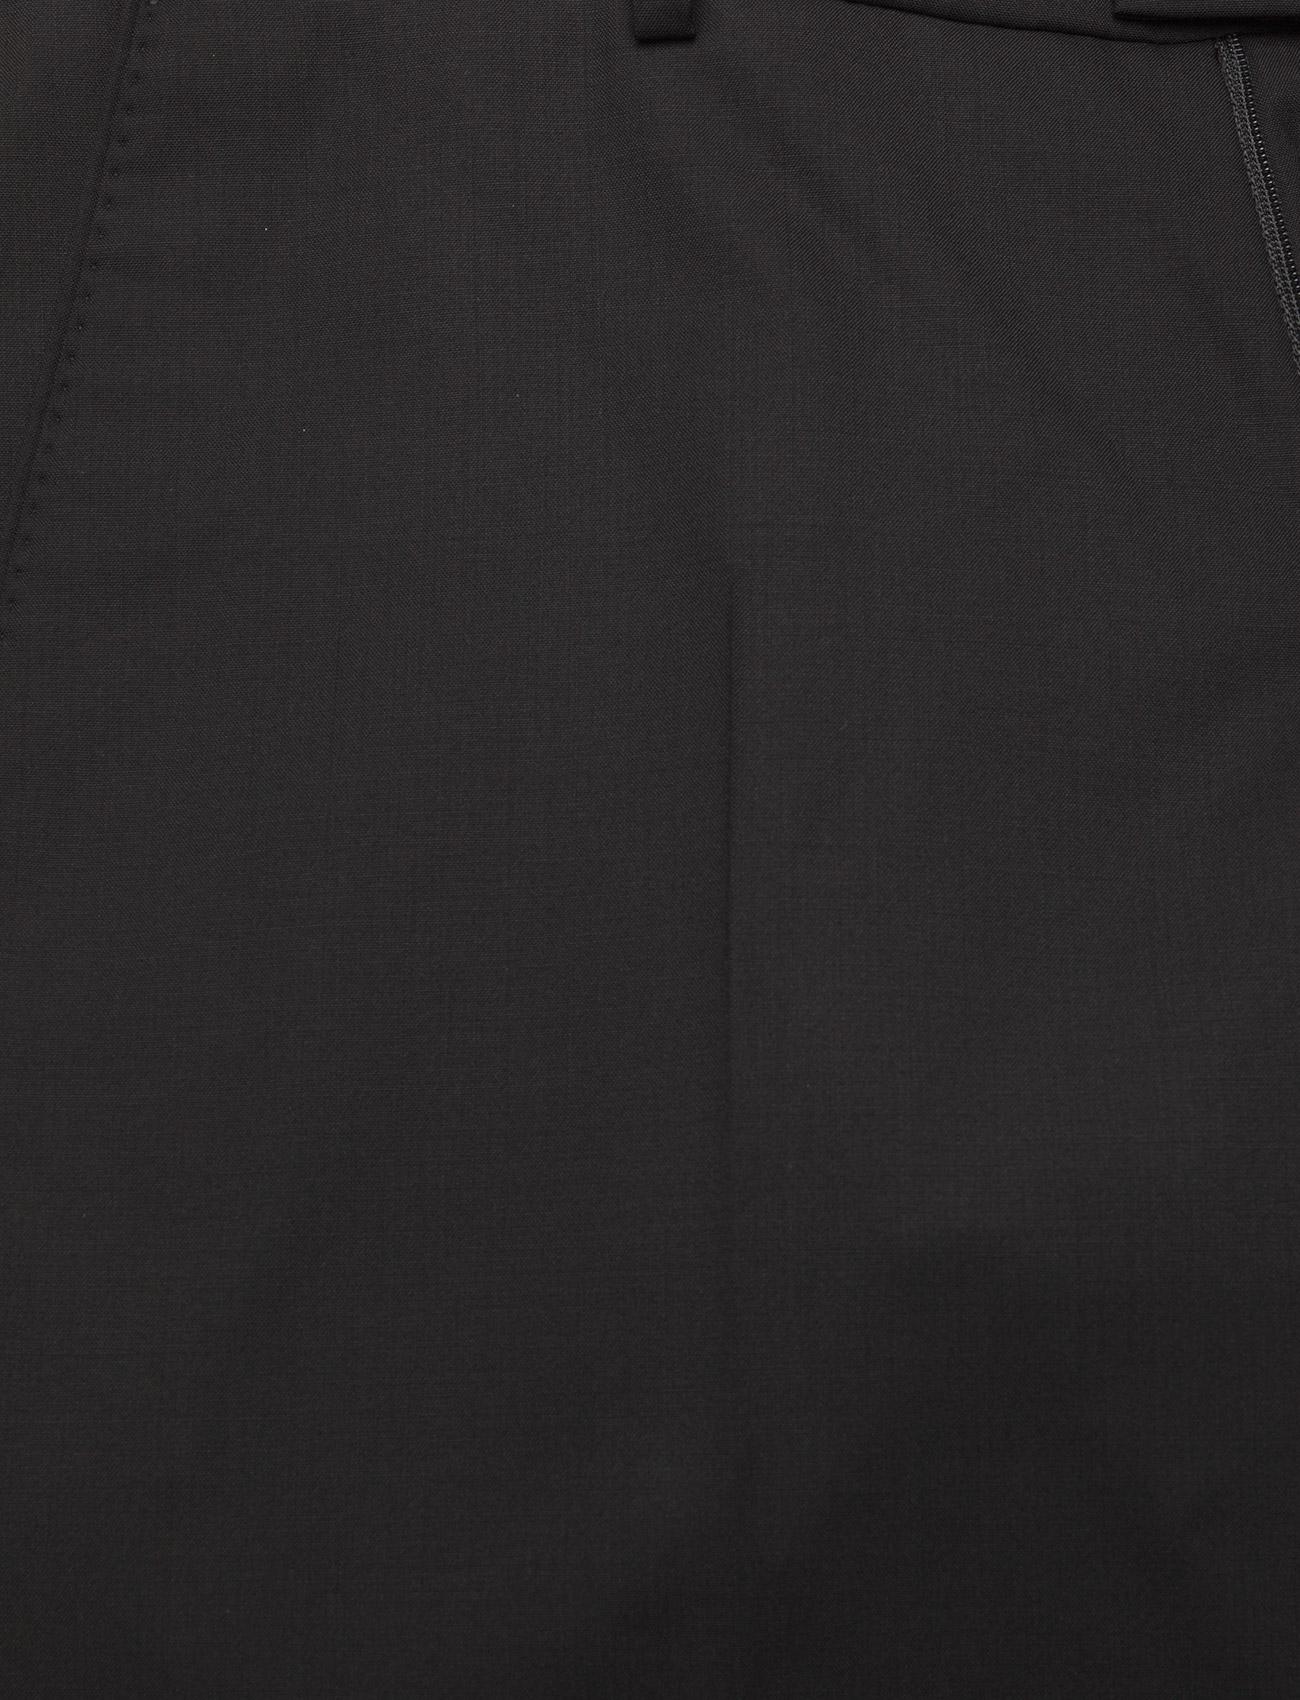 Trousers310BlackOscar Jacobson Trousers310BlackOscar Damien Damien Jacobson Damien jqSGLUMVzp